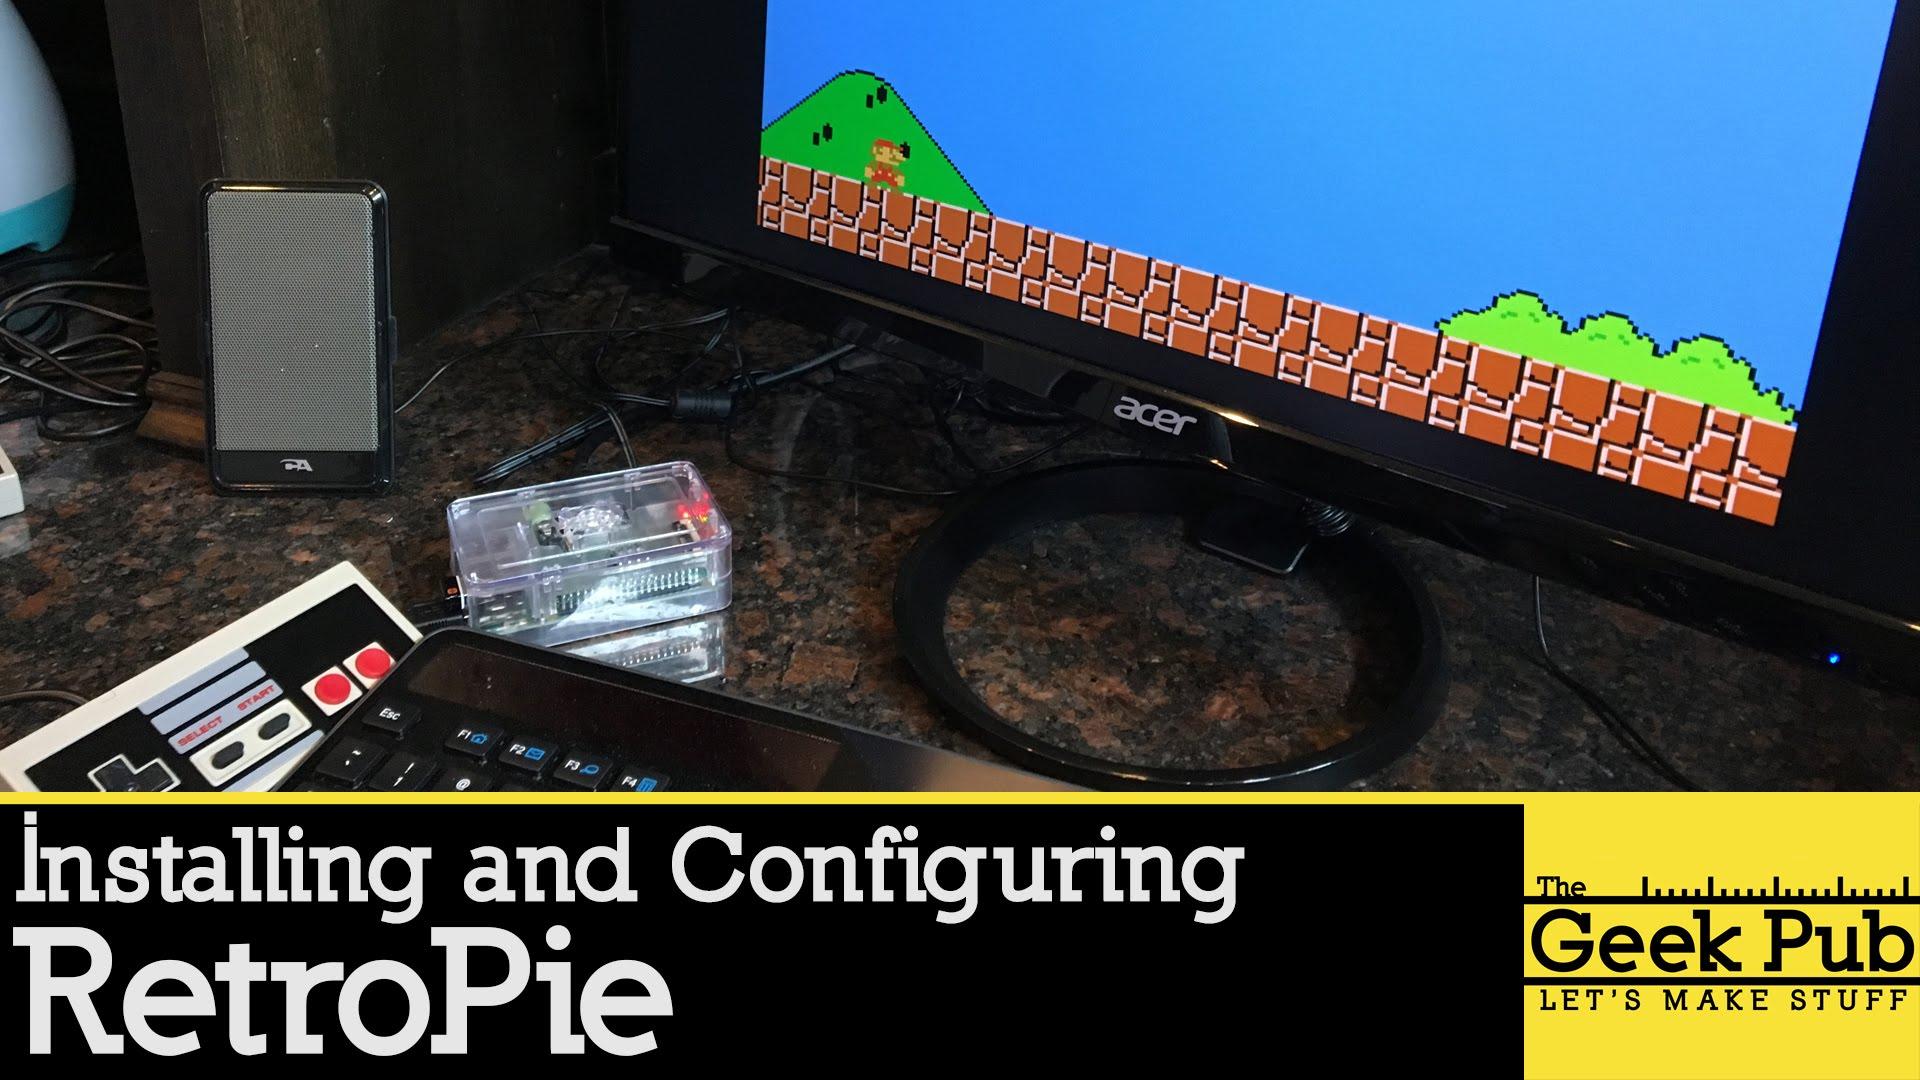 Setting up Retropie on a Raspberry Pi 3 for an Arcade